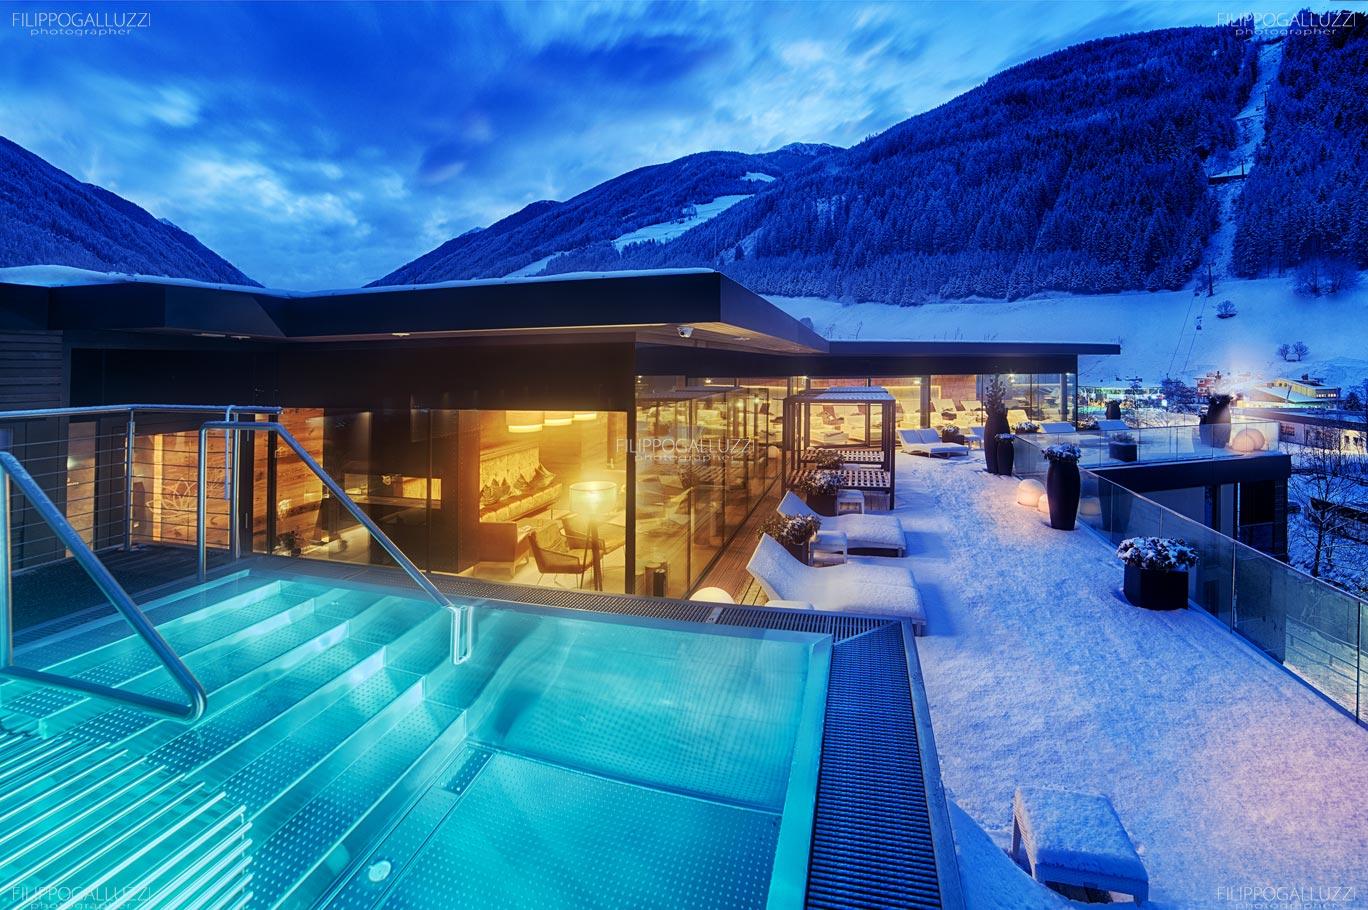 Fotografia Hotel Wellness Sky Pool Alpenschloessl & Linderhof Ahrntal